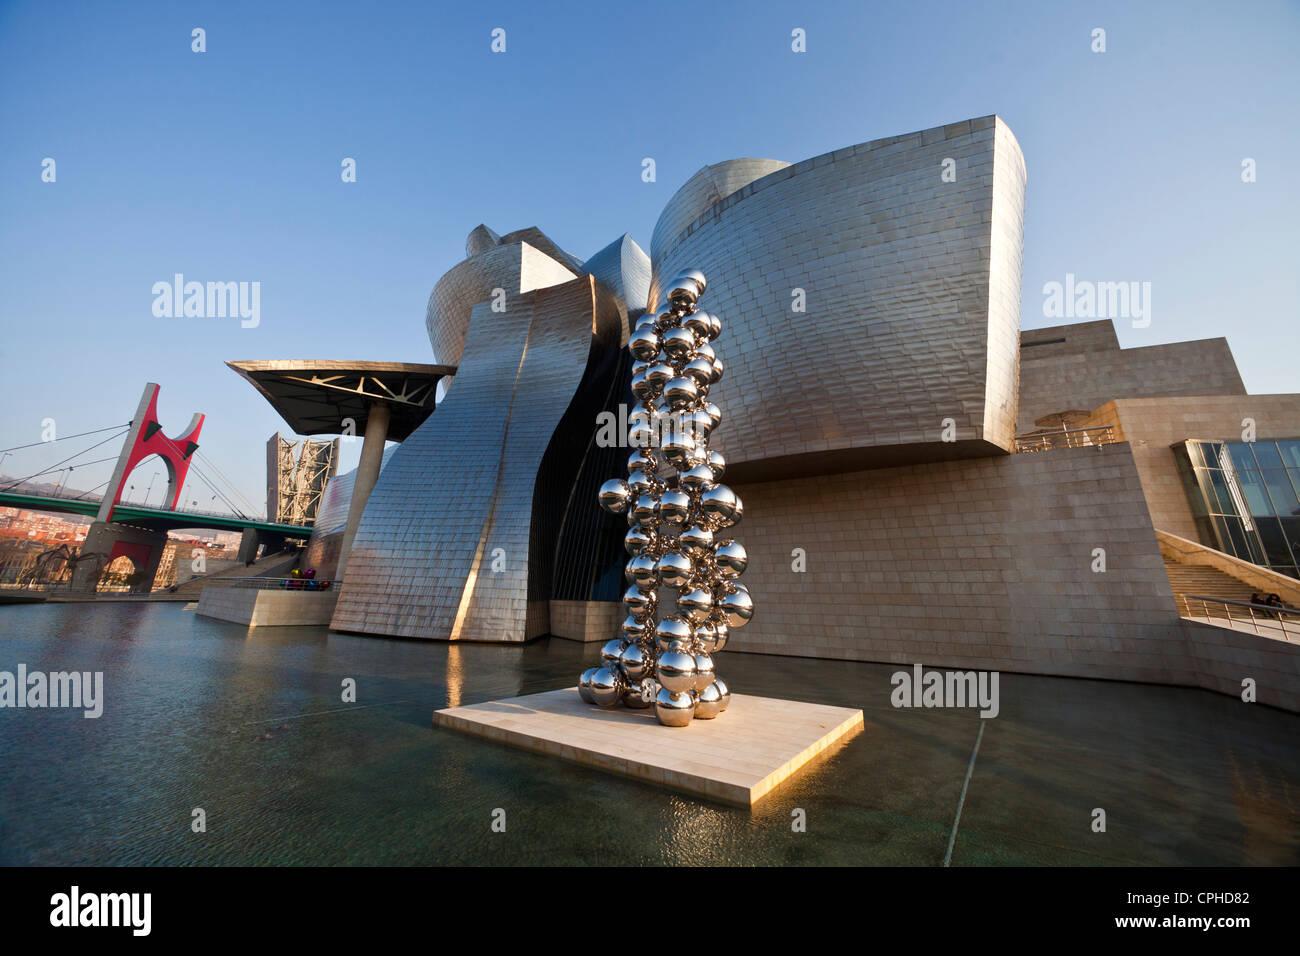 Berühmte Architektur spanien europa baskenland bilbao architekt architektur bilbao